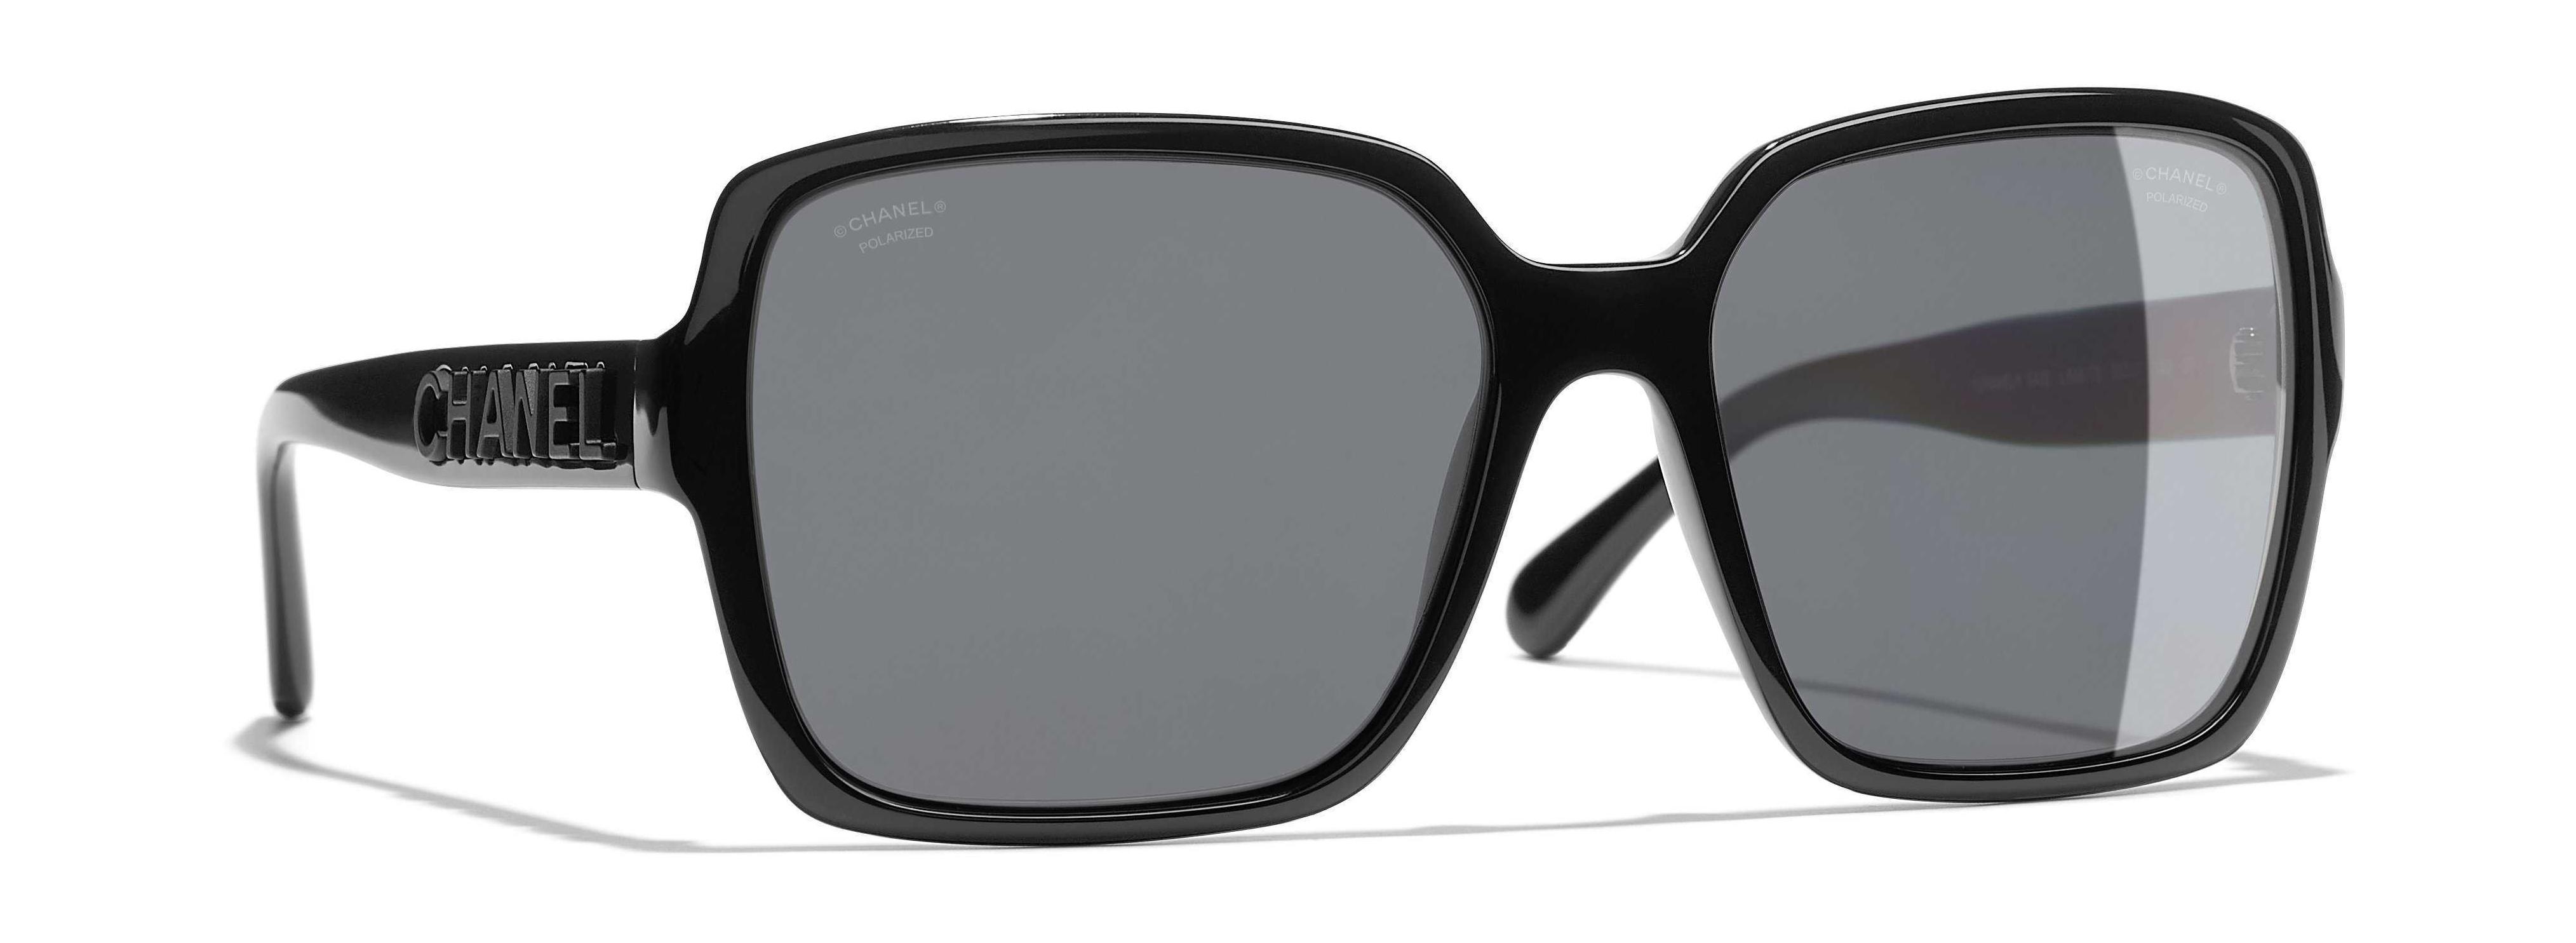 Sunglasses Women CHANEL CH 5408 C888T8 56/17